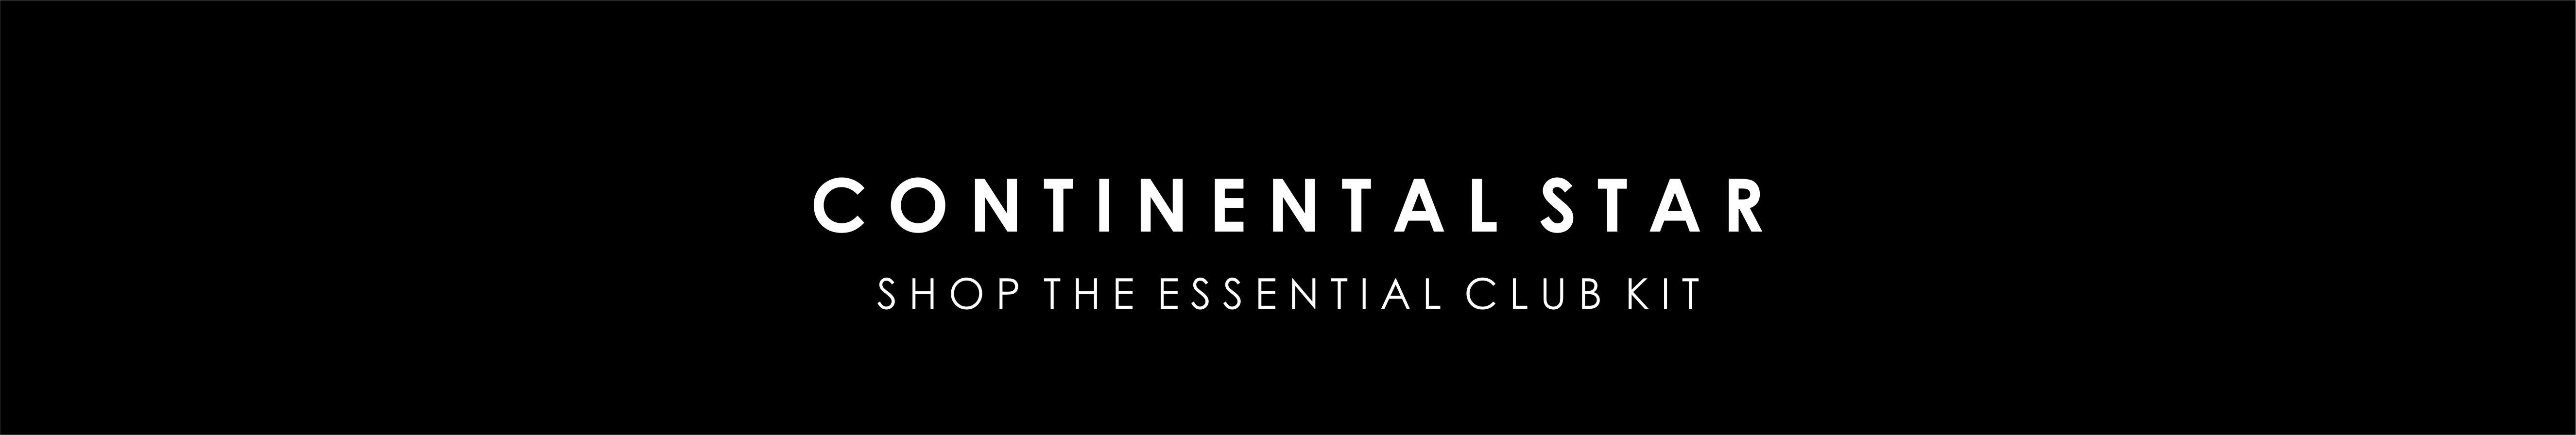 continental-start-banner.jpg